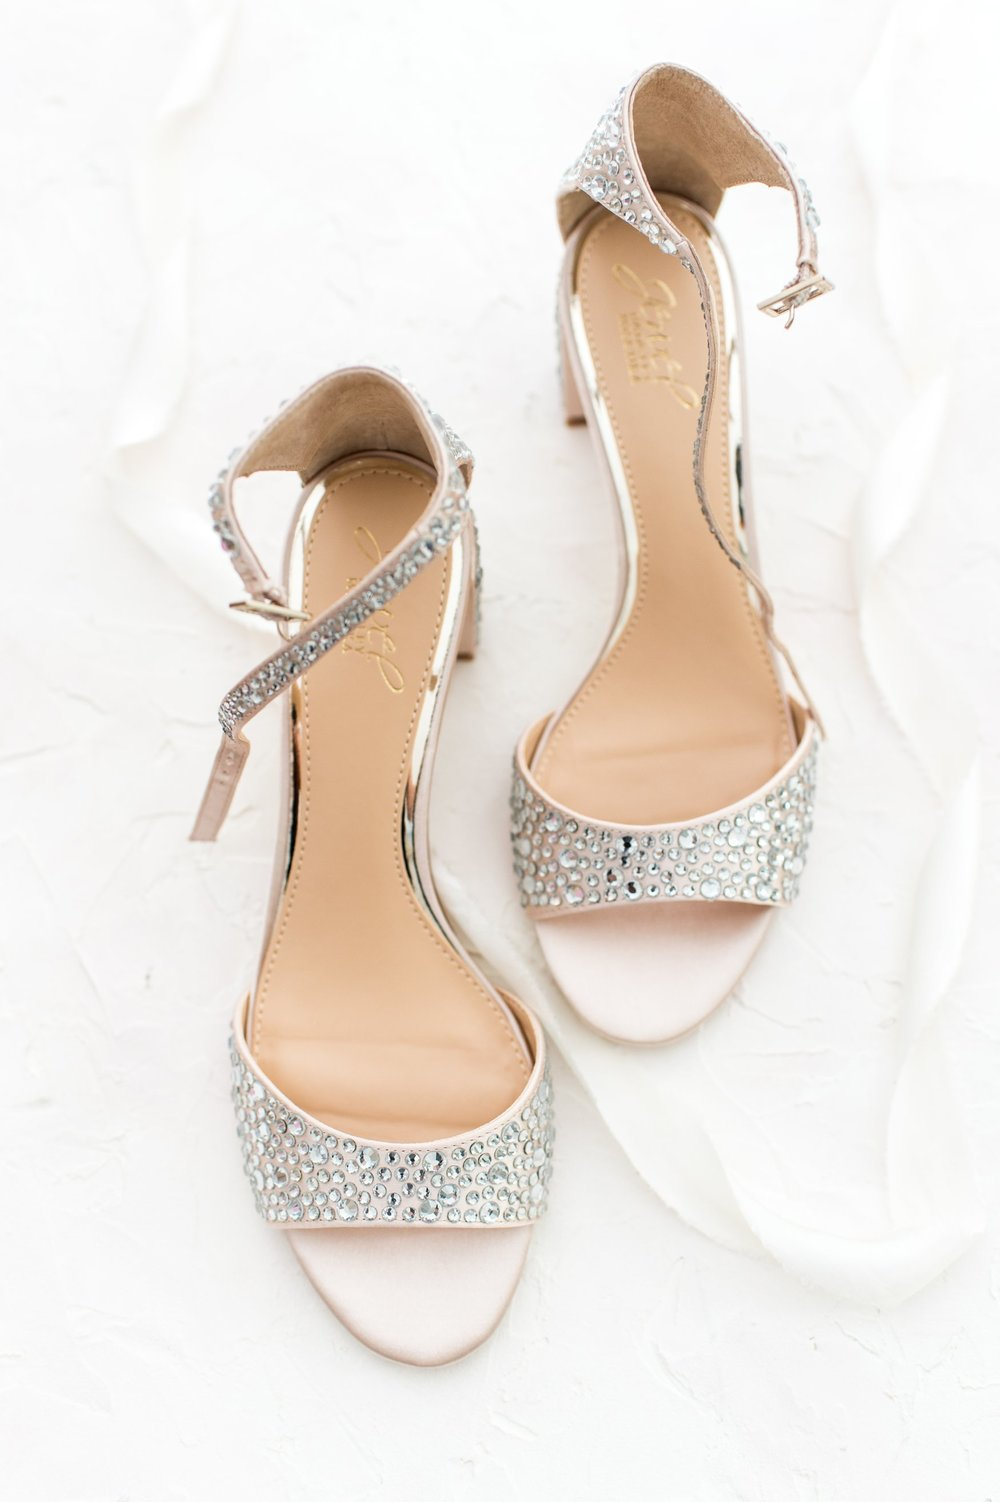 Jewel by Badgley Mischka sparkly chunky heel bridal shoes styled flat lay